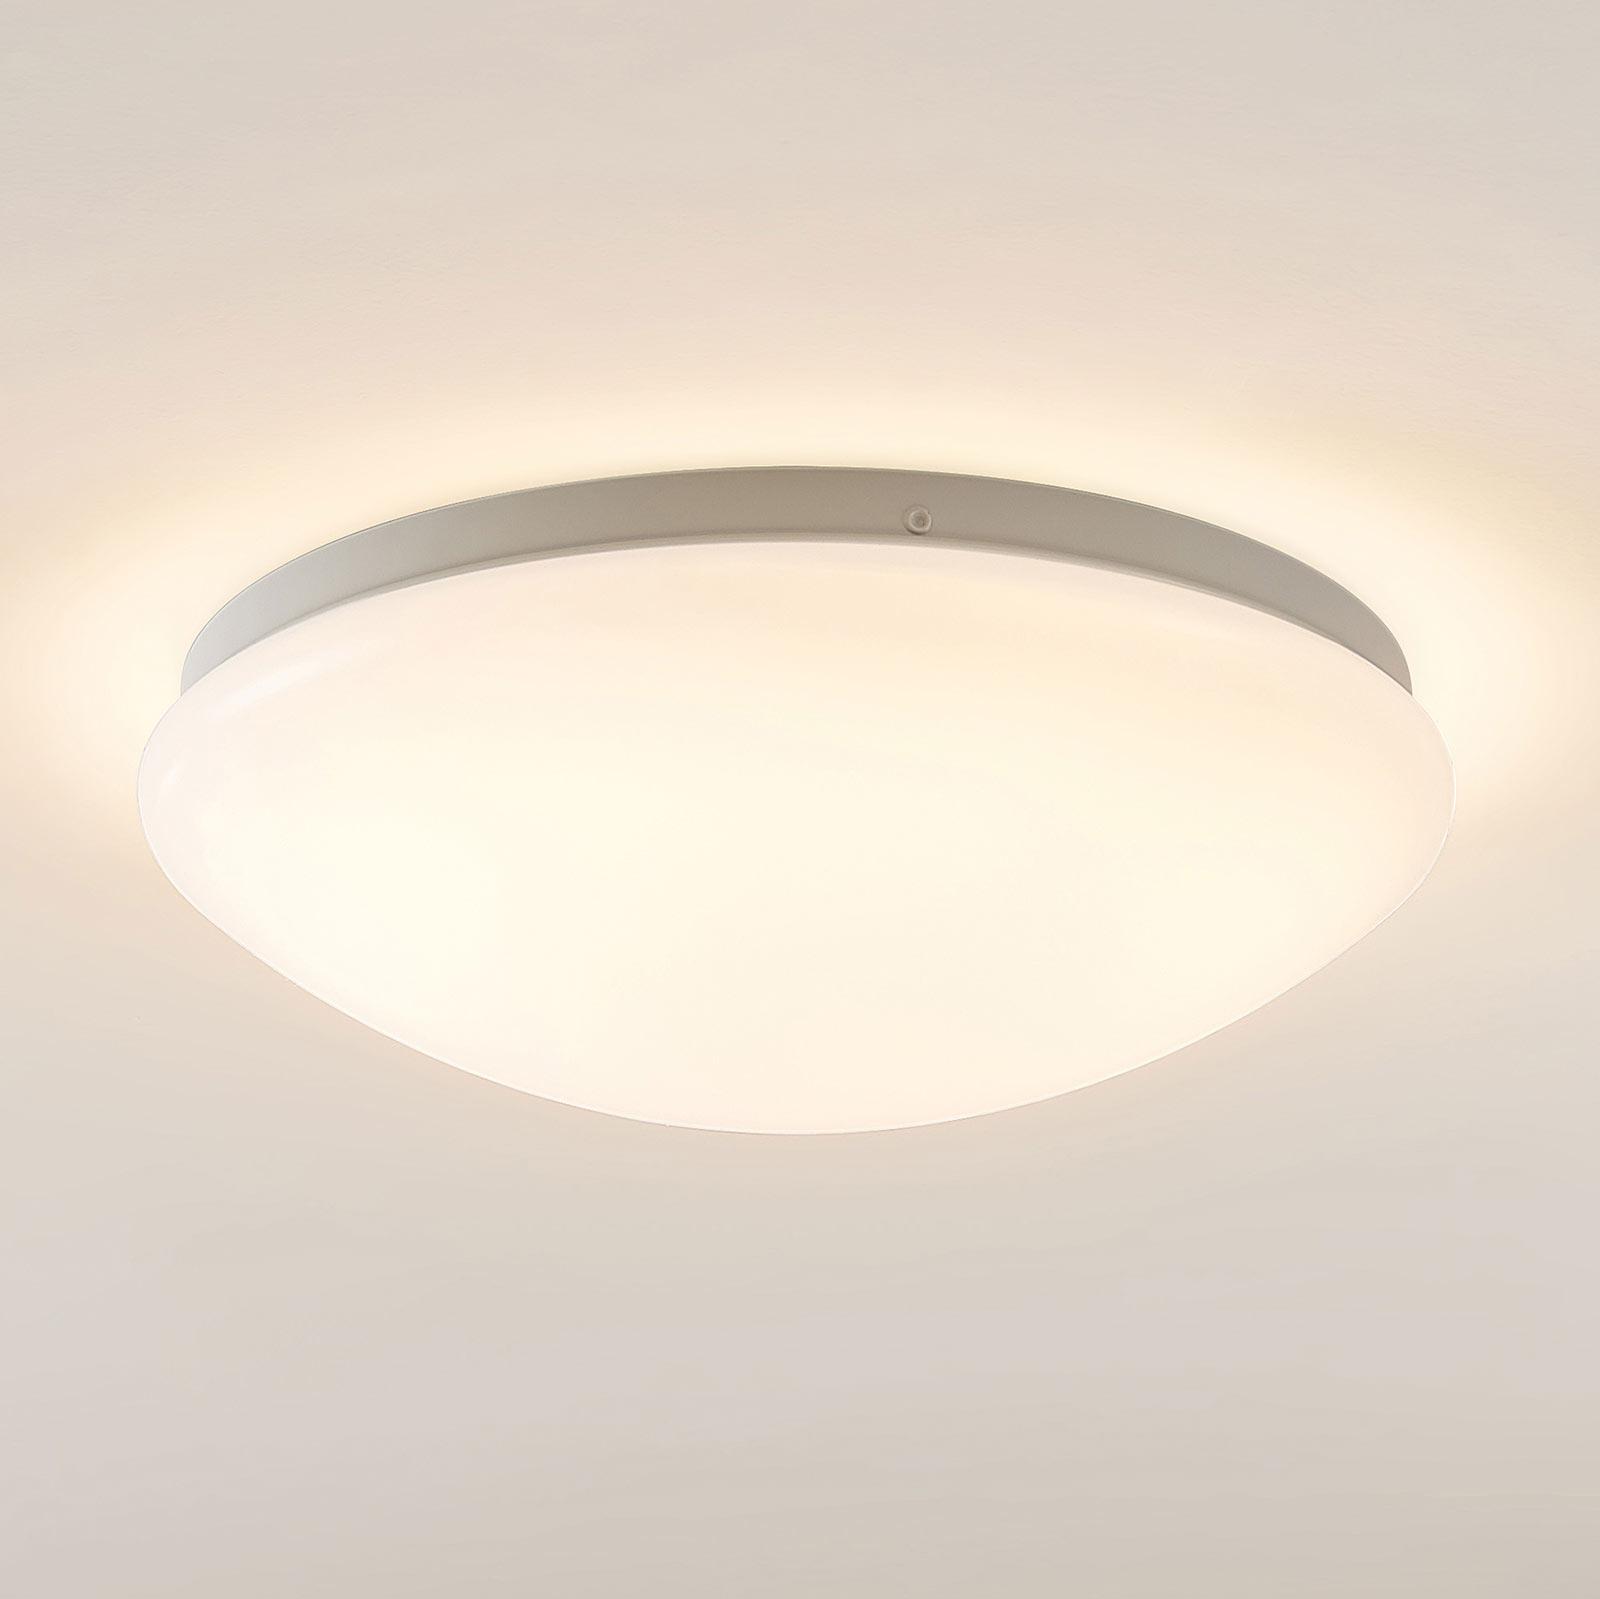 Arcchio Younes lampa sufitowa LED, biała, 30 cm